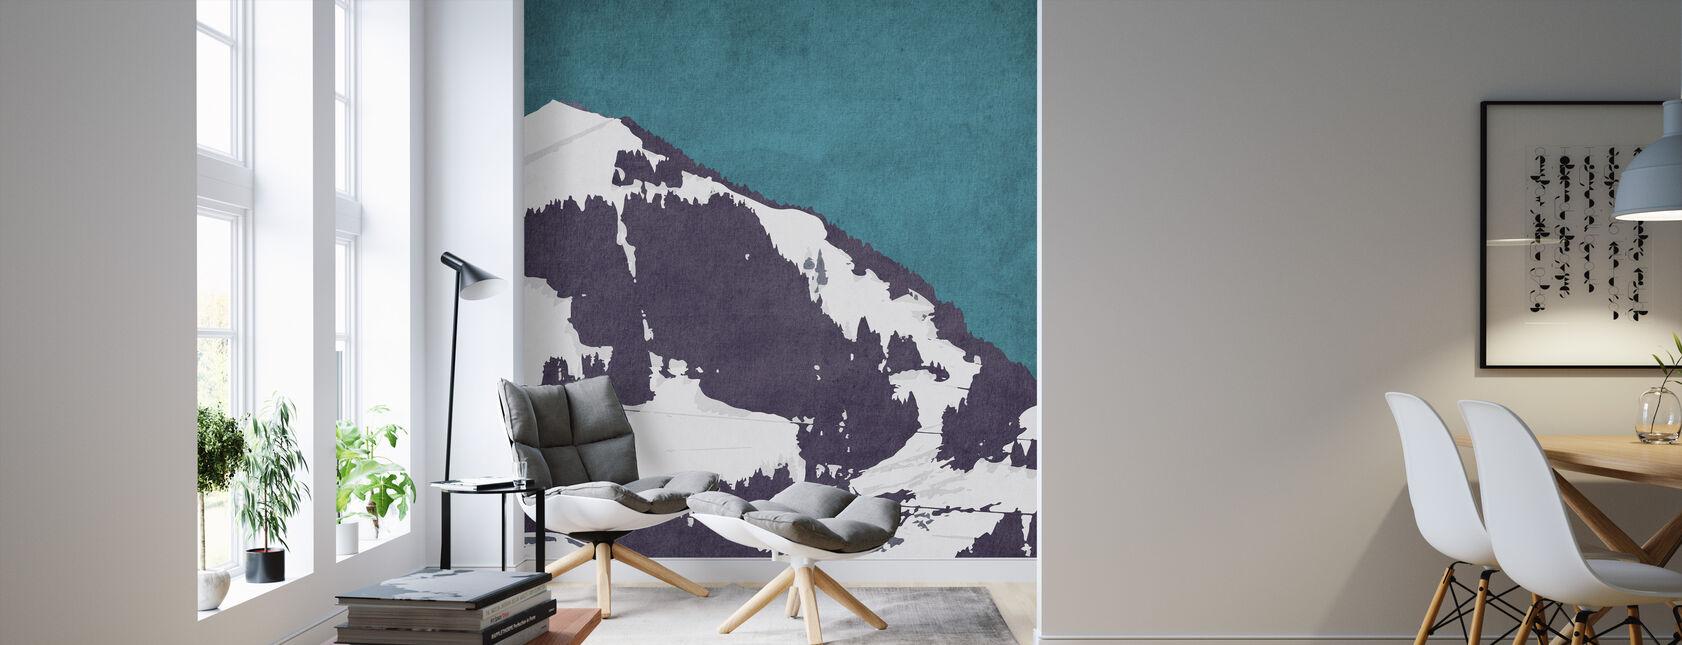 The Alps - Wallpaper - Living Room